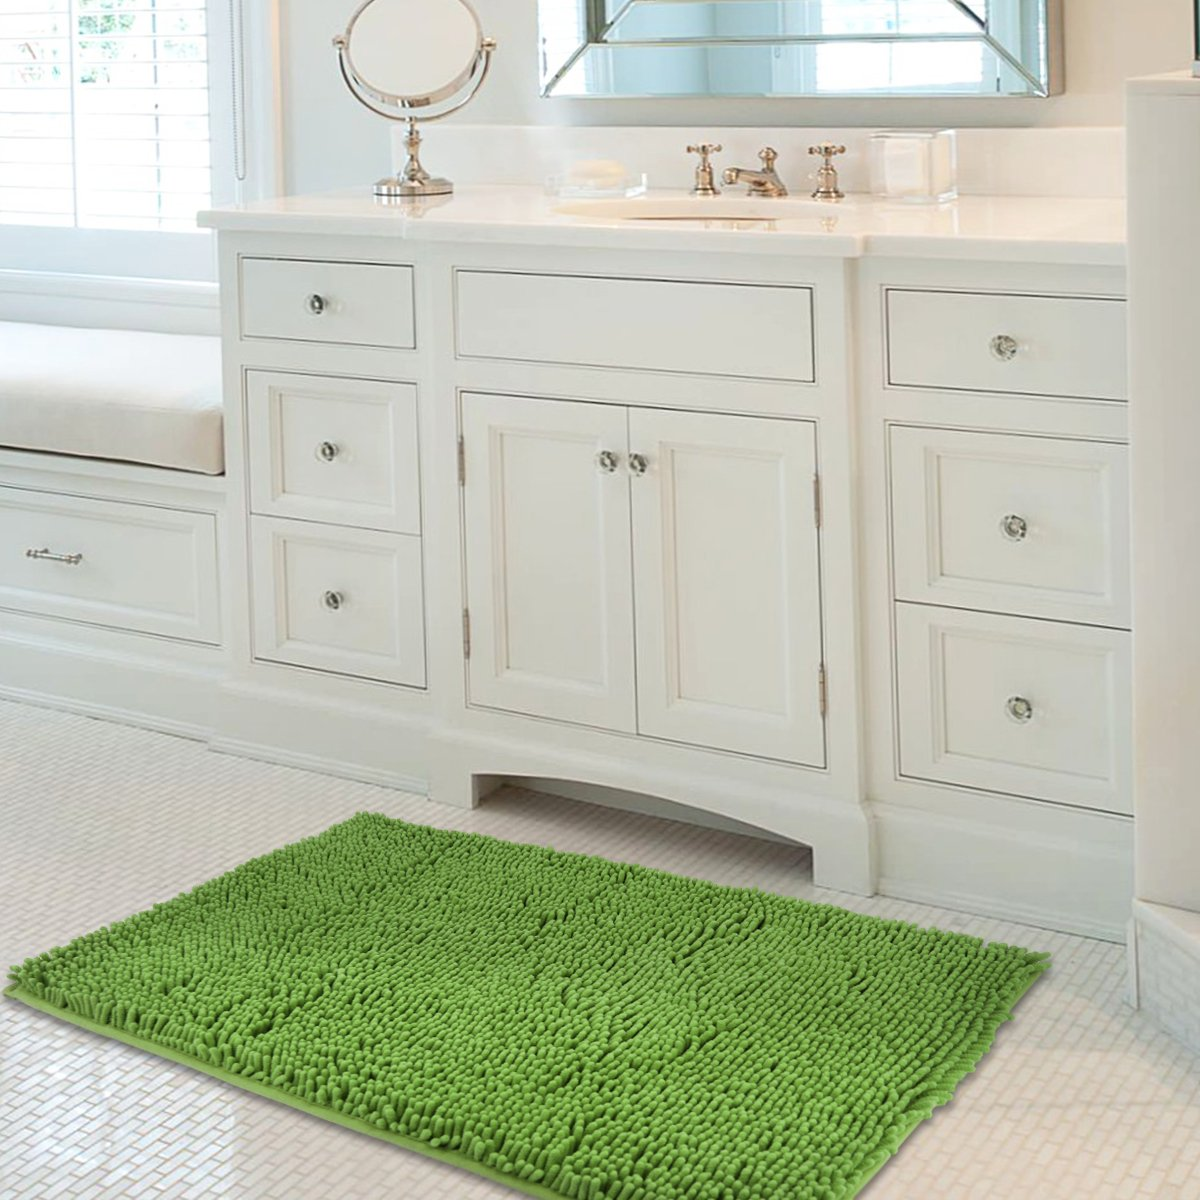 Mayshine 24x39 inch Non-slip Bathroom Rug Shag Shower Mat Machine-washable Bath mats